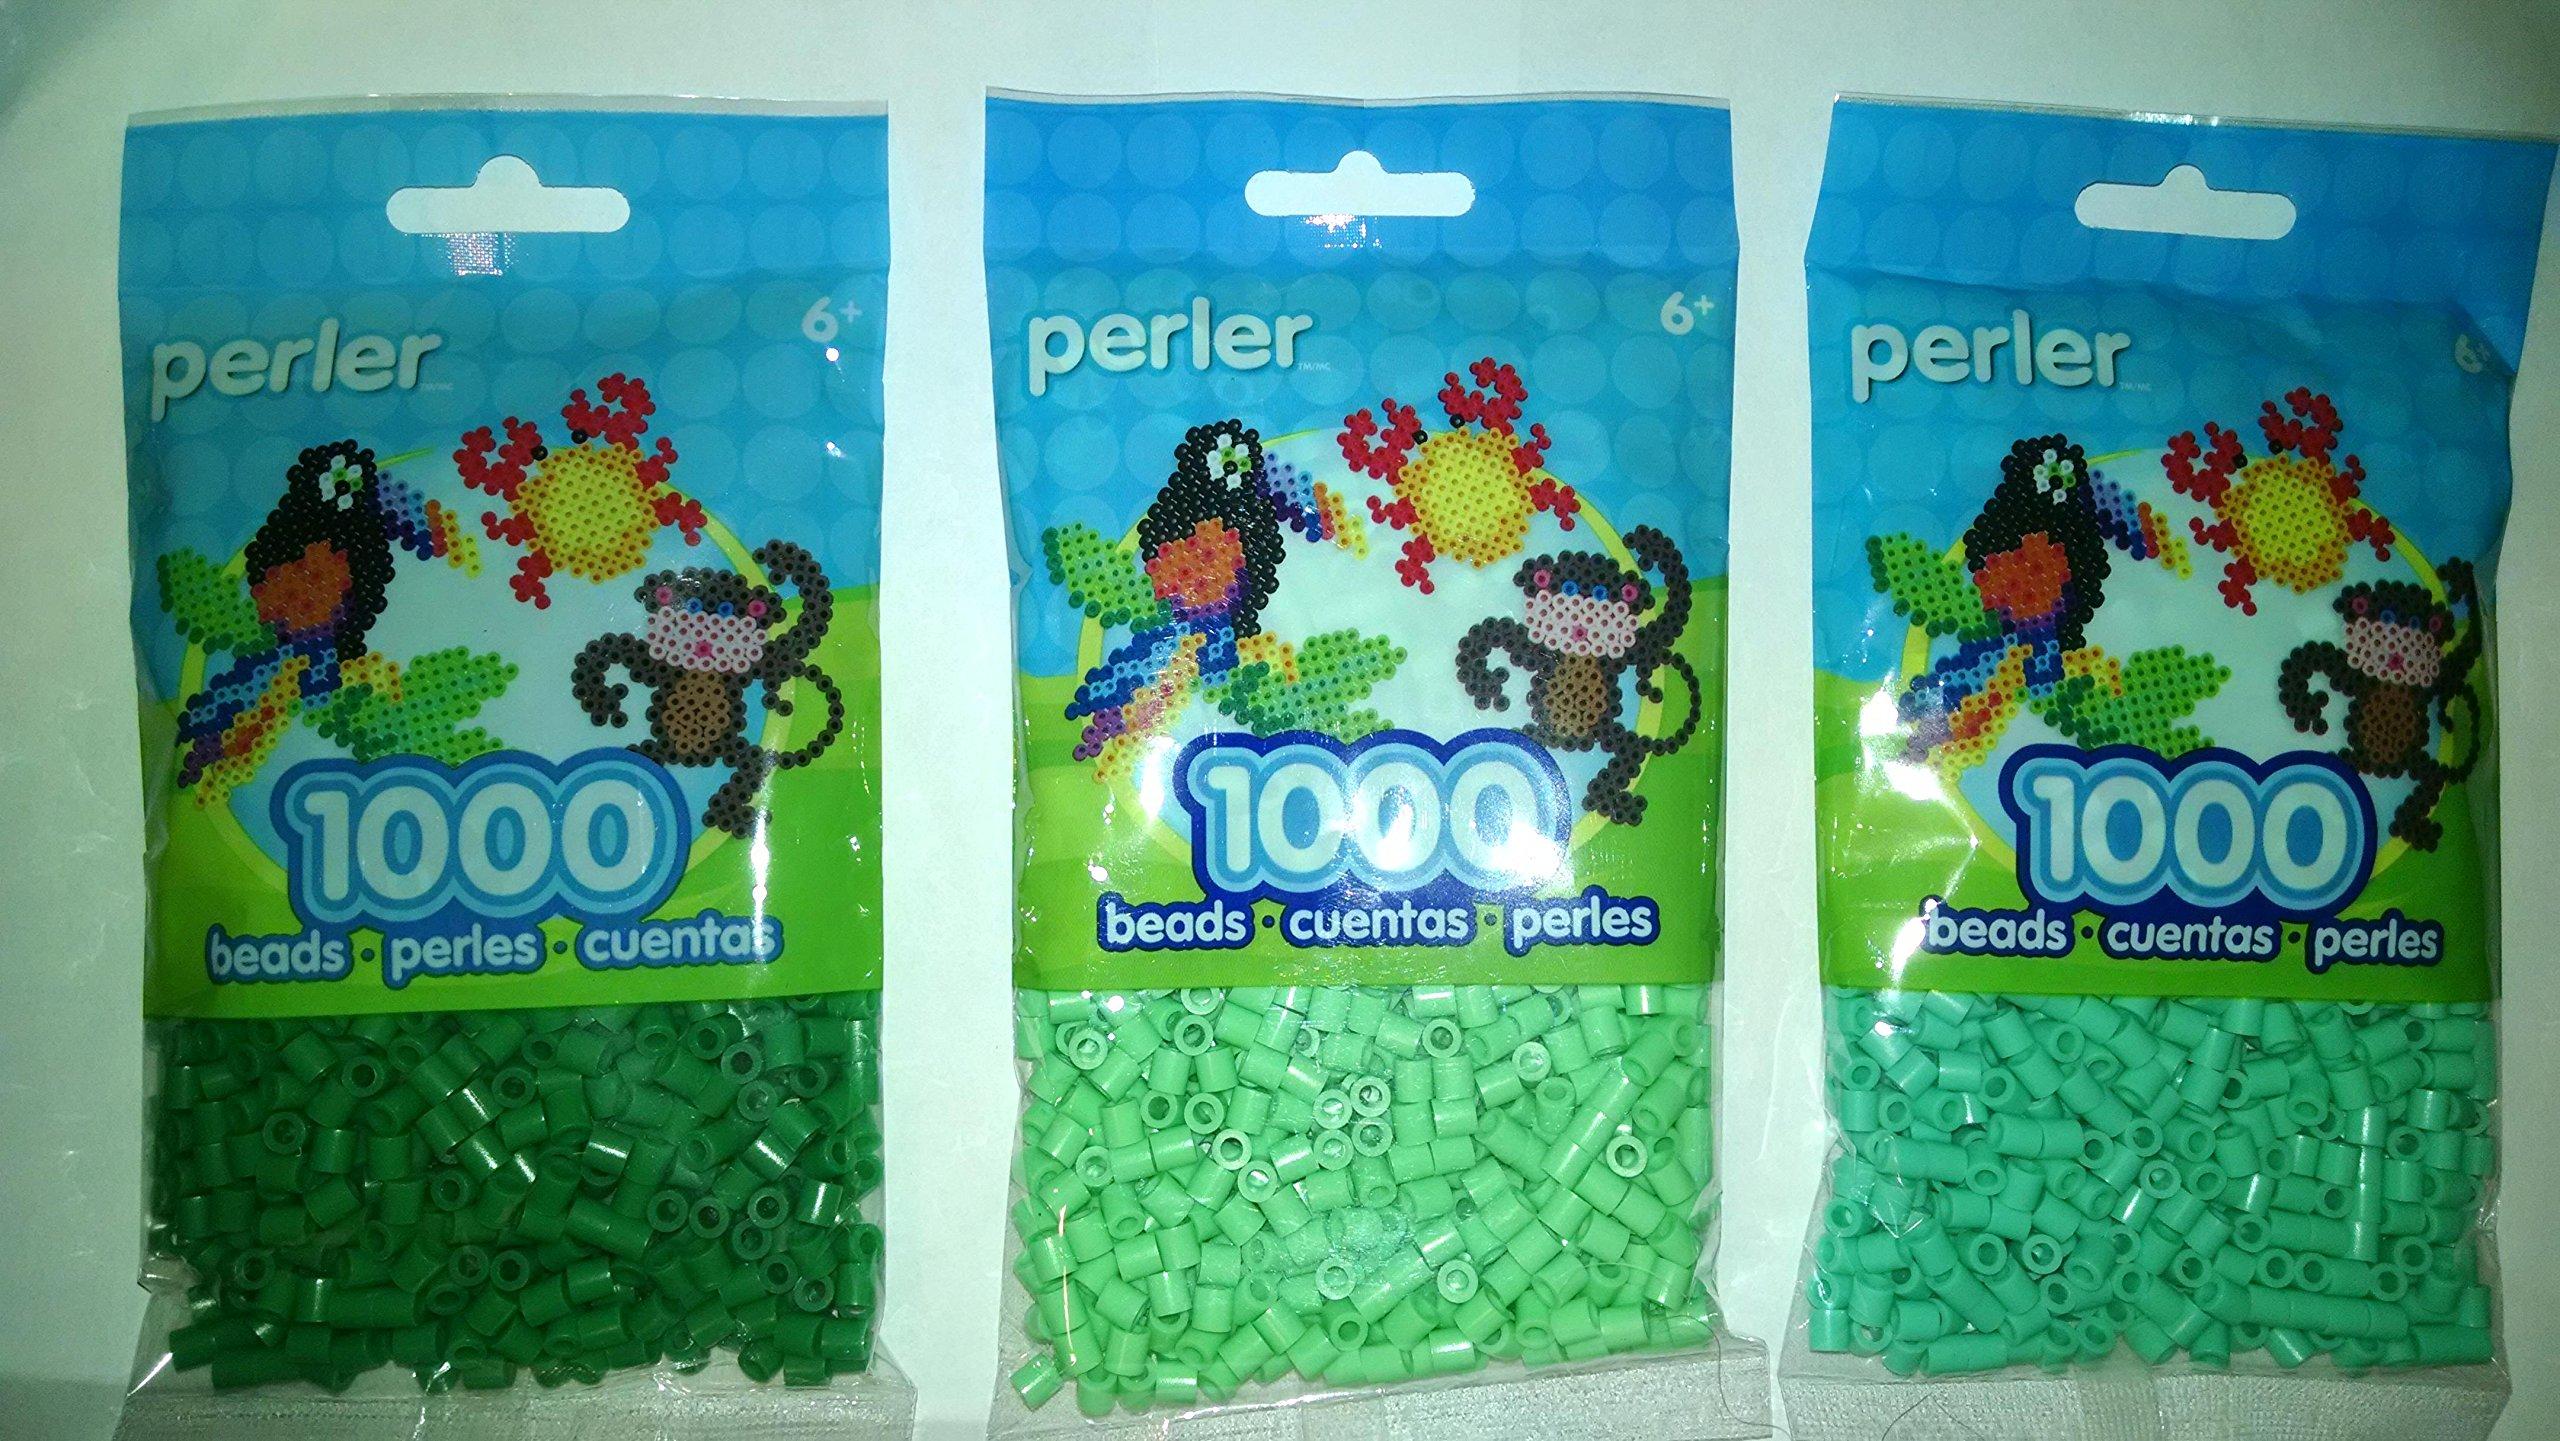 Perler Bead Bag, Group (Dark Green, Light Green, Pastel Green)